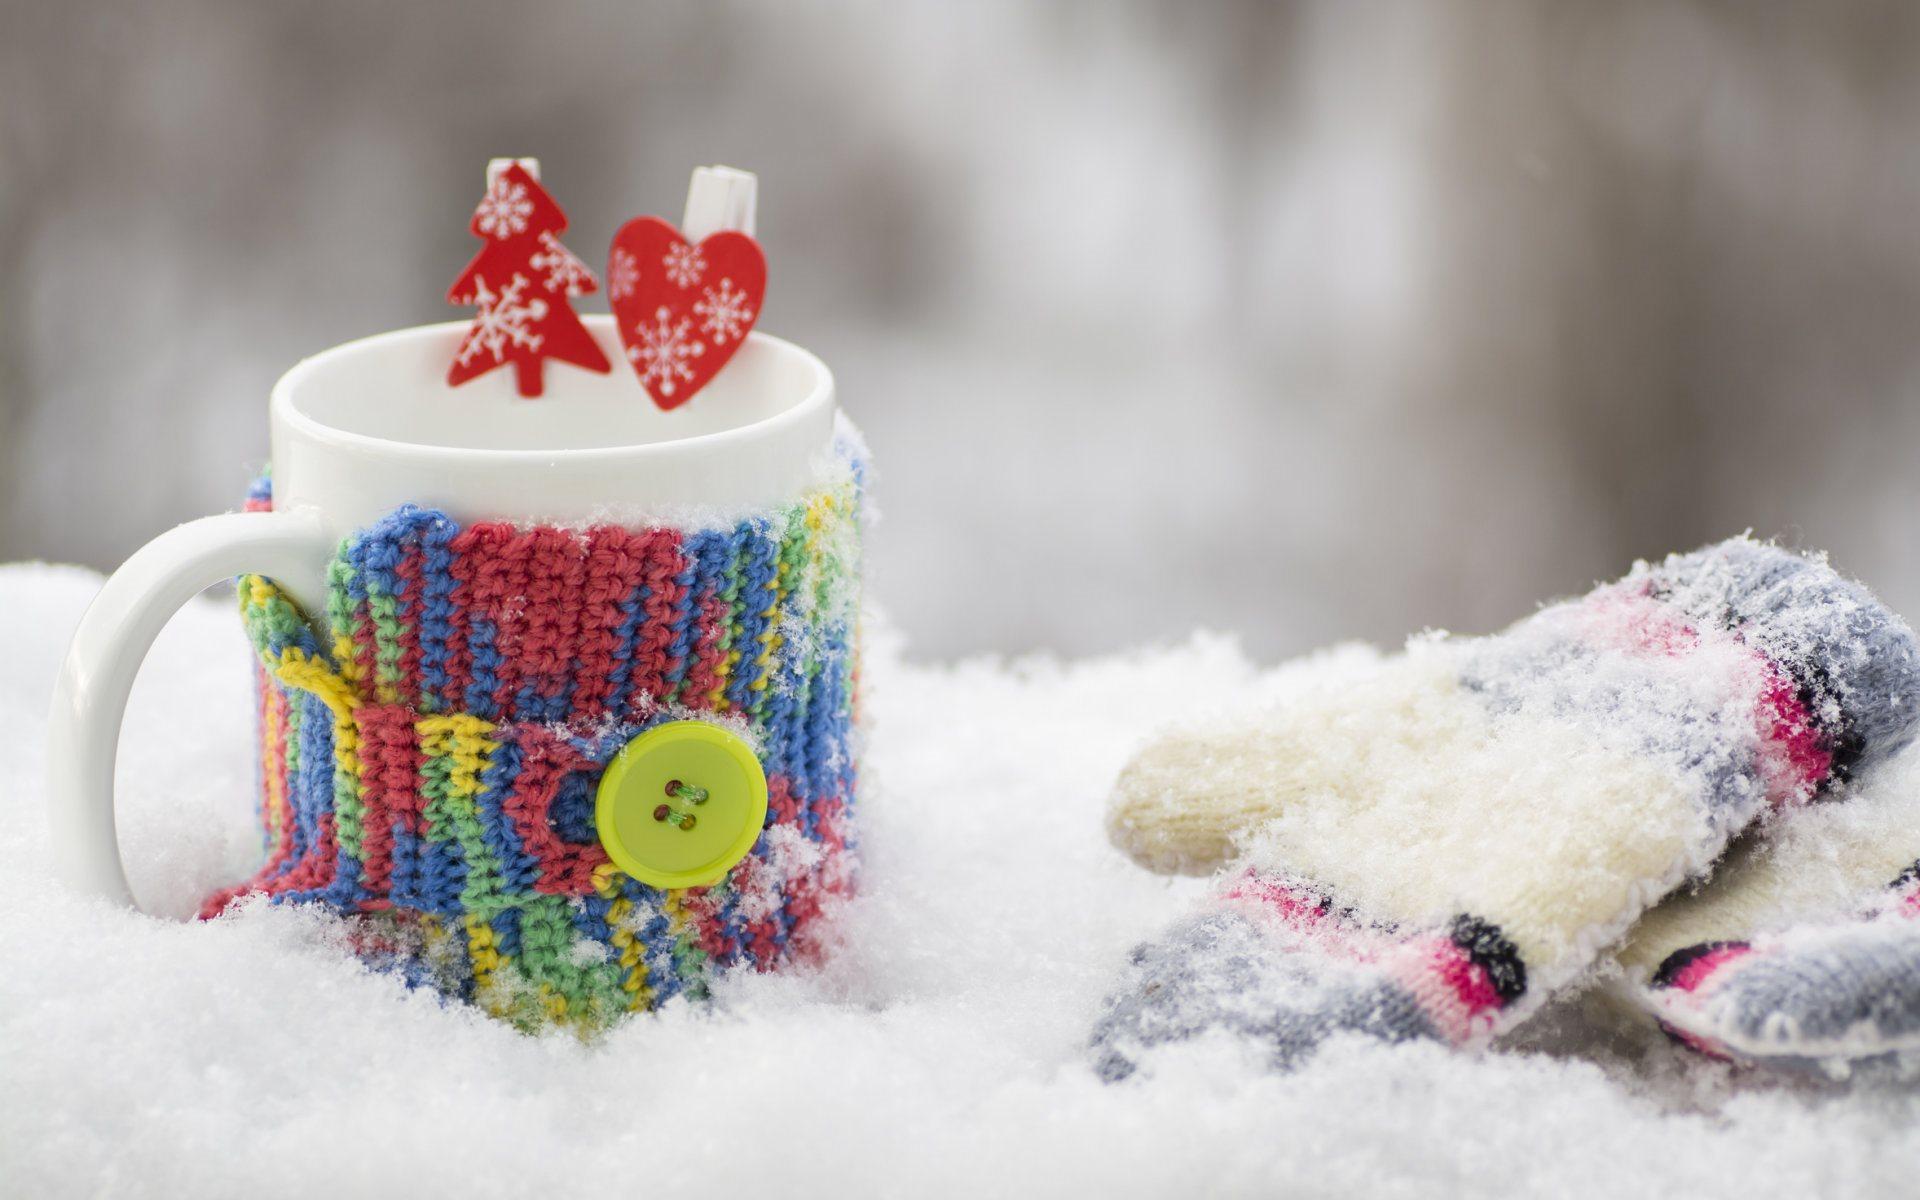 машине картинки чашек зимой сразу хочу